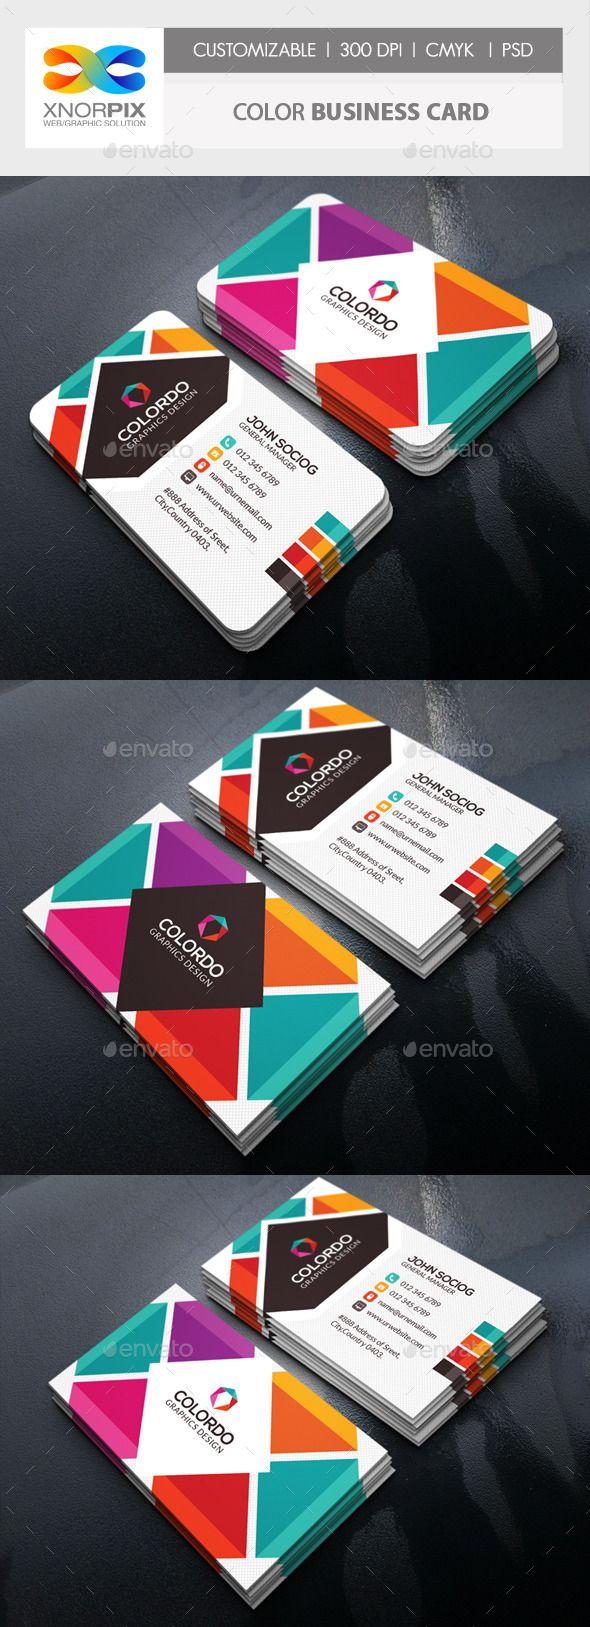 Color Business Card Template PSD #design Download: http://graphicriver.net/item/color-business-card/13547275?ref=ksioks